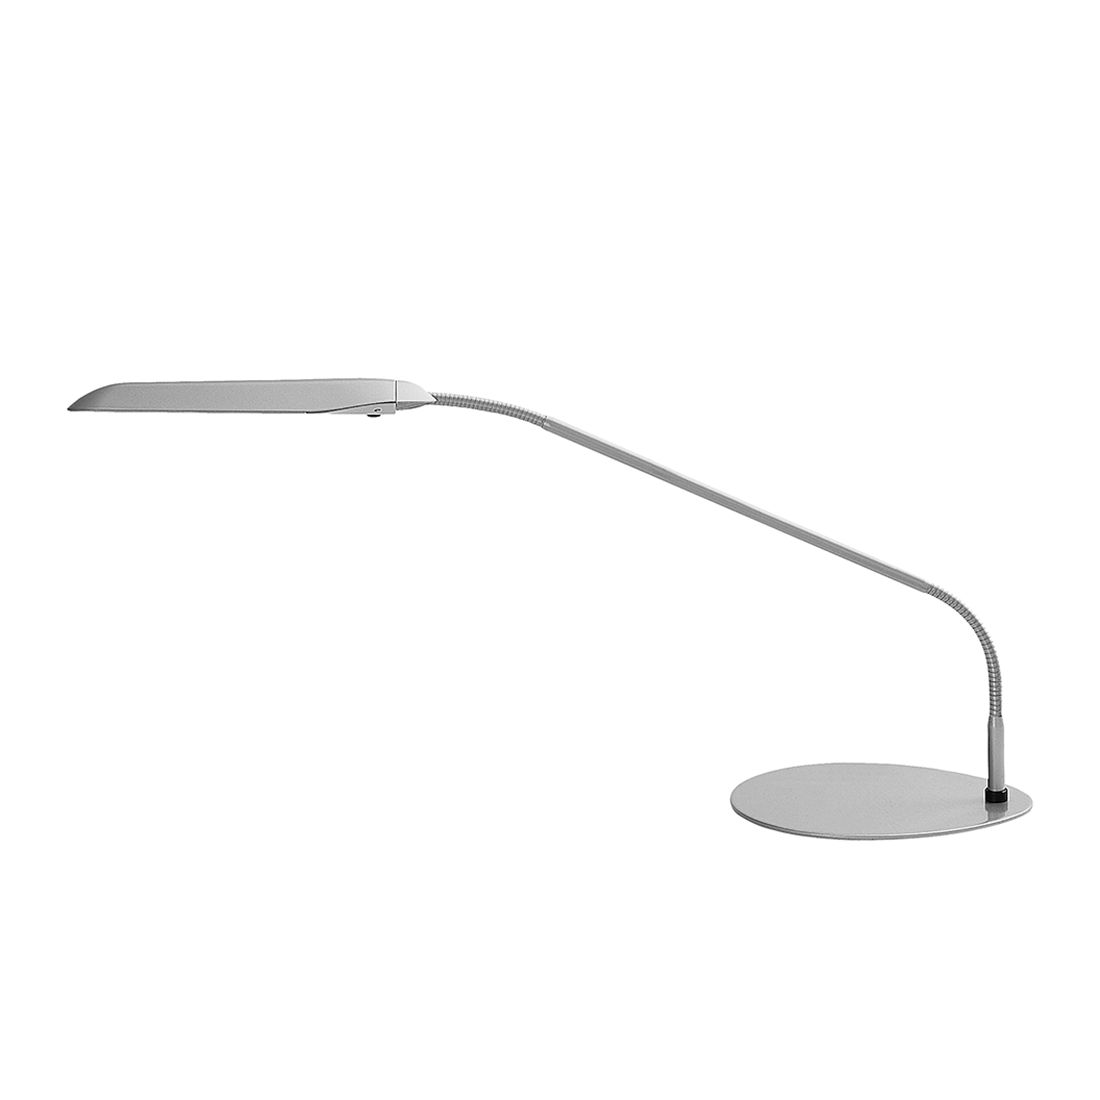 Tischleuchte IS 2A ● Metall/Kunststoff ● Grau ● 1-flammig- Blanke Design A